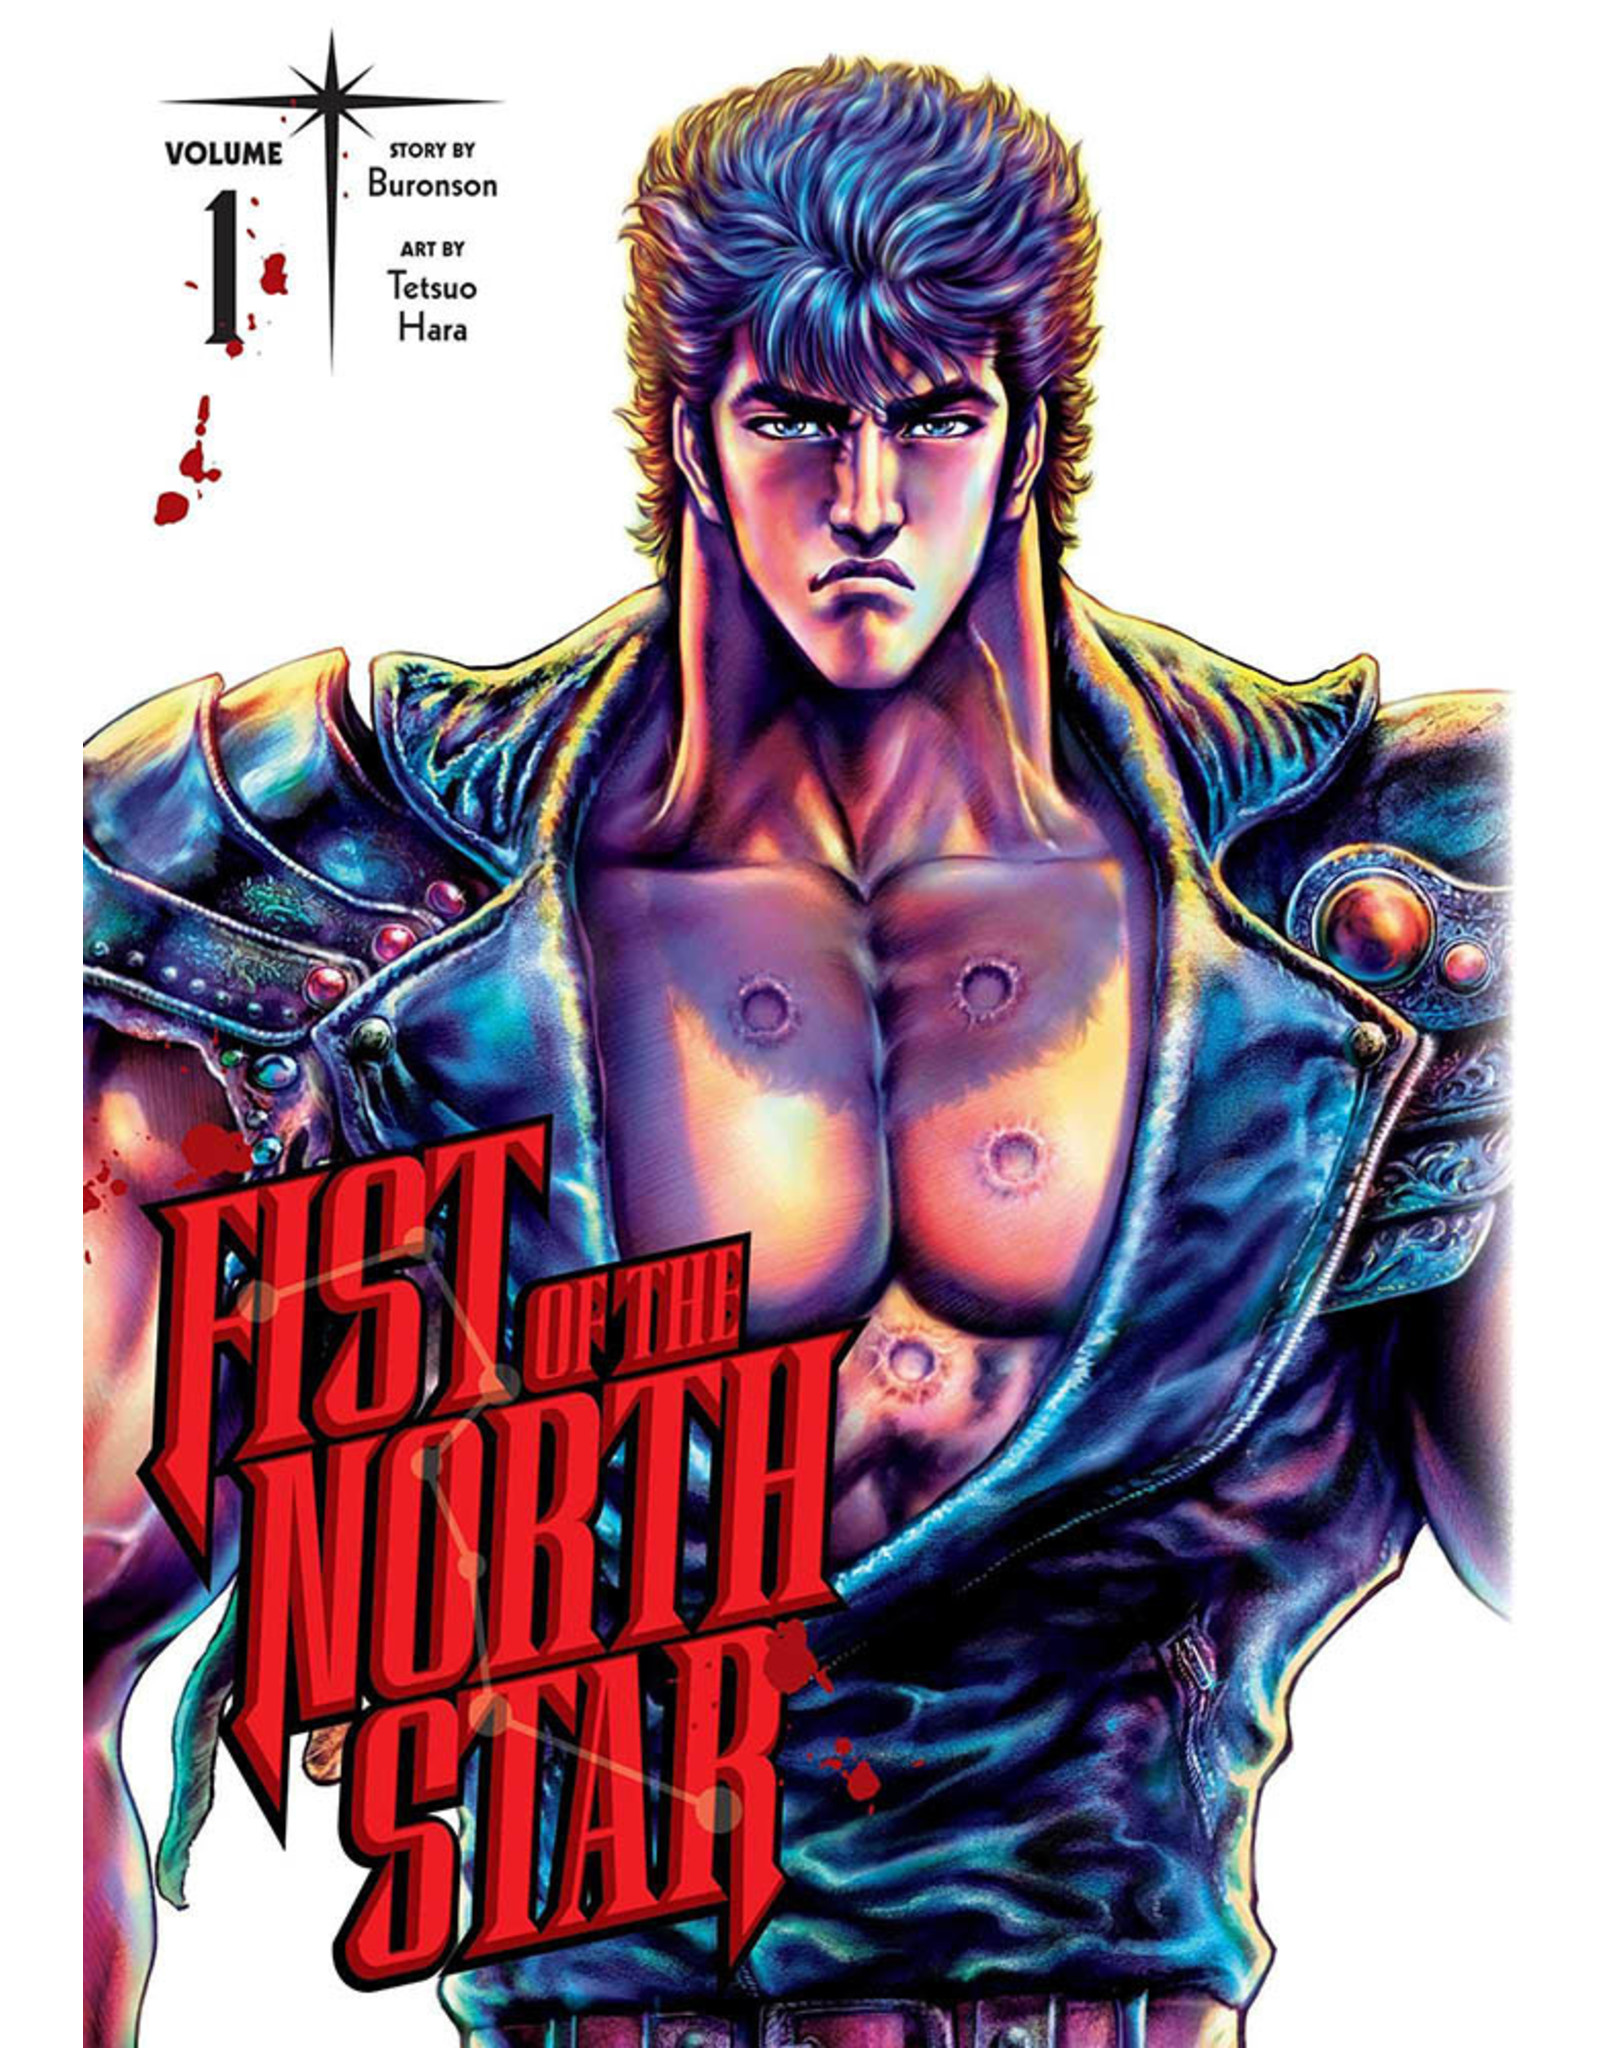 Fist of the North Star 1 (Engelstalig) - Hardcover Viz Signature Edition - Manga